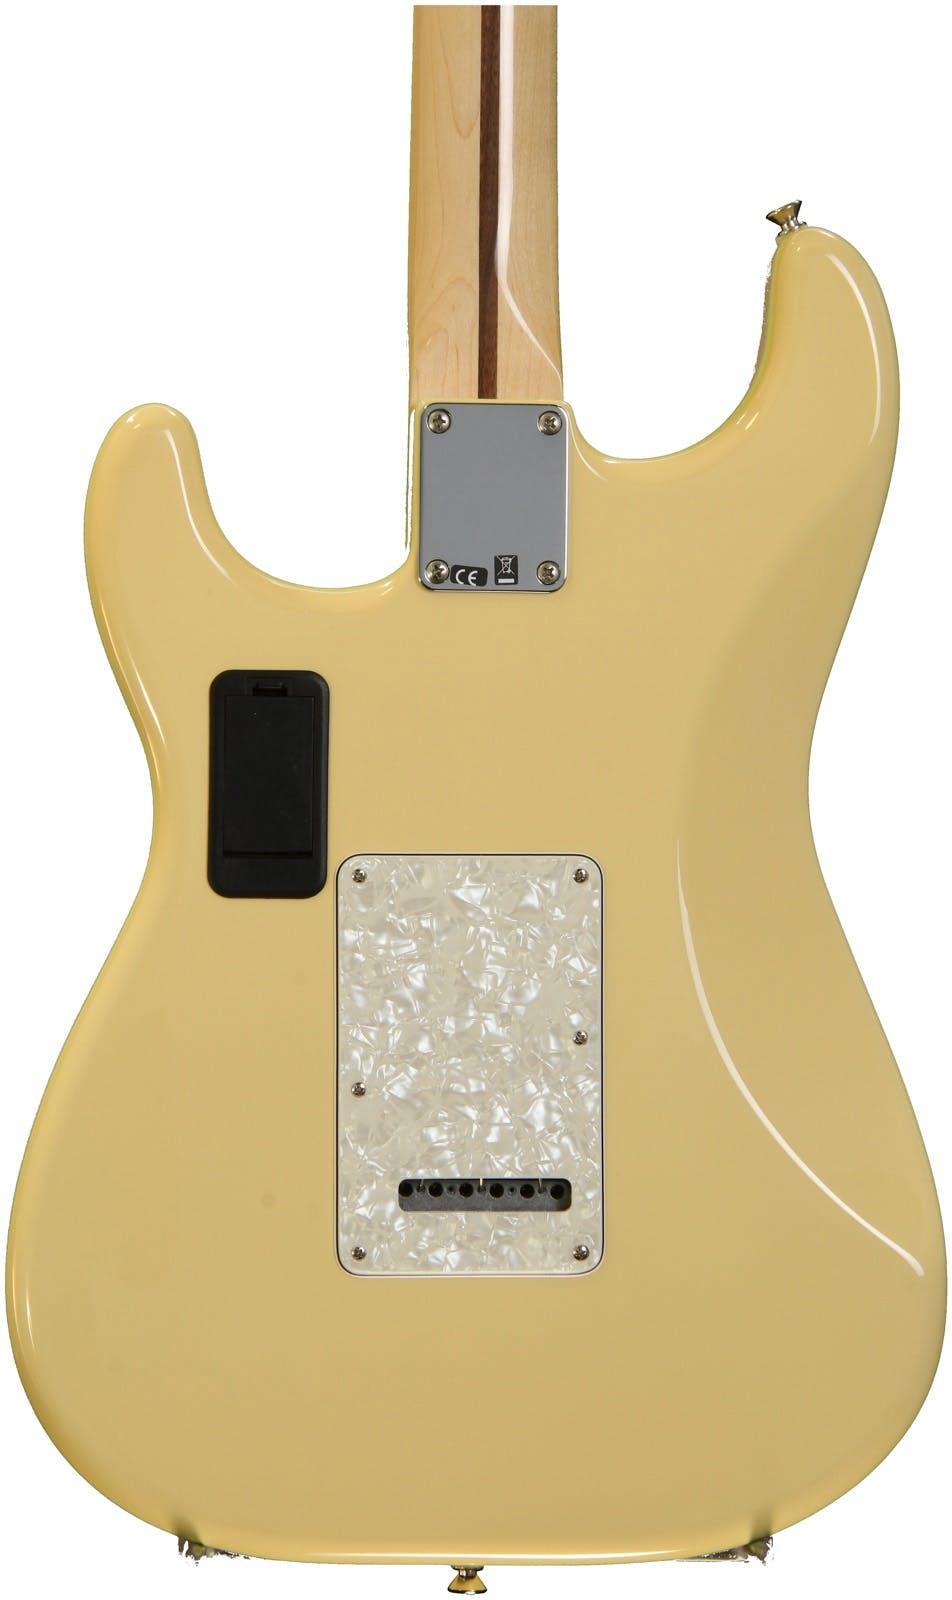 1-Pack Fender Pure Vintage Stratocaster Guitar Vintage White Switch Tip